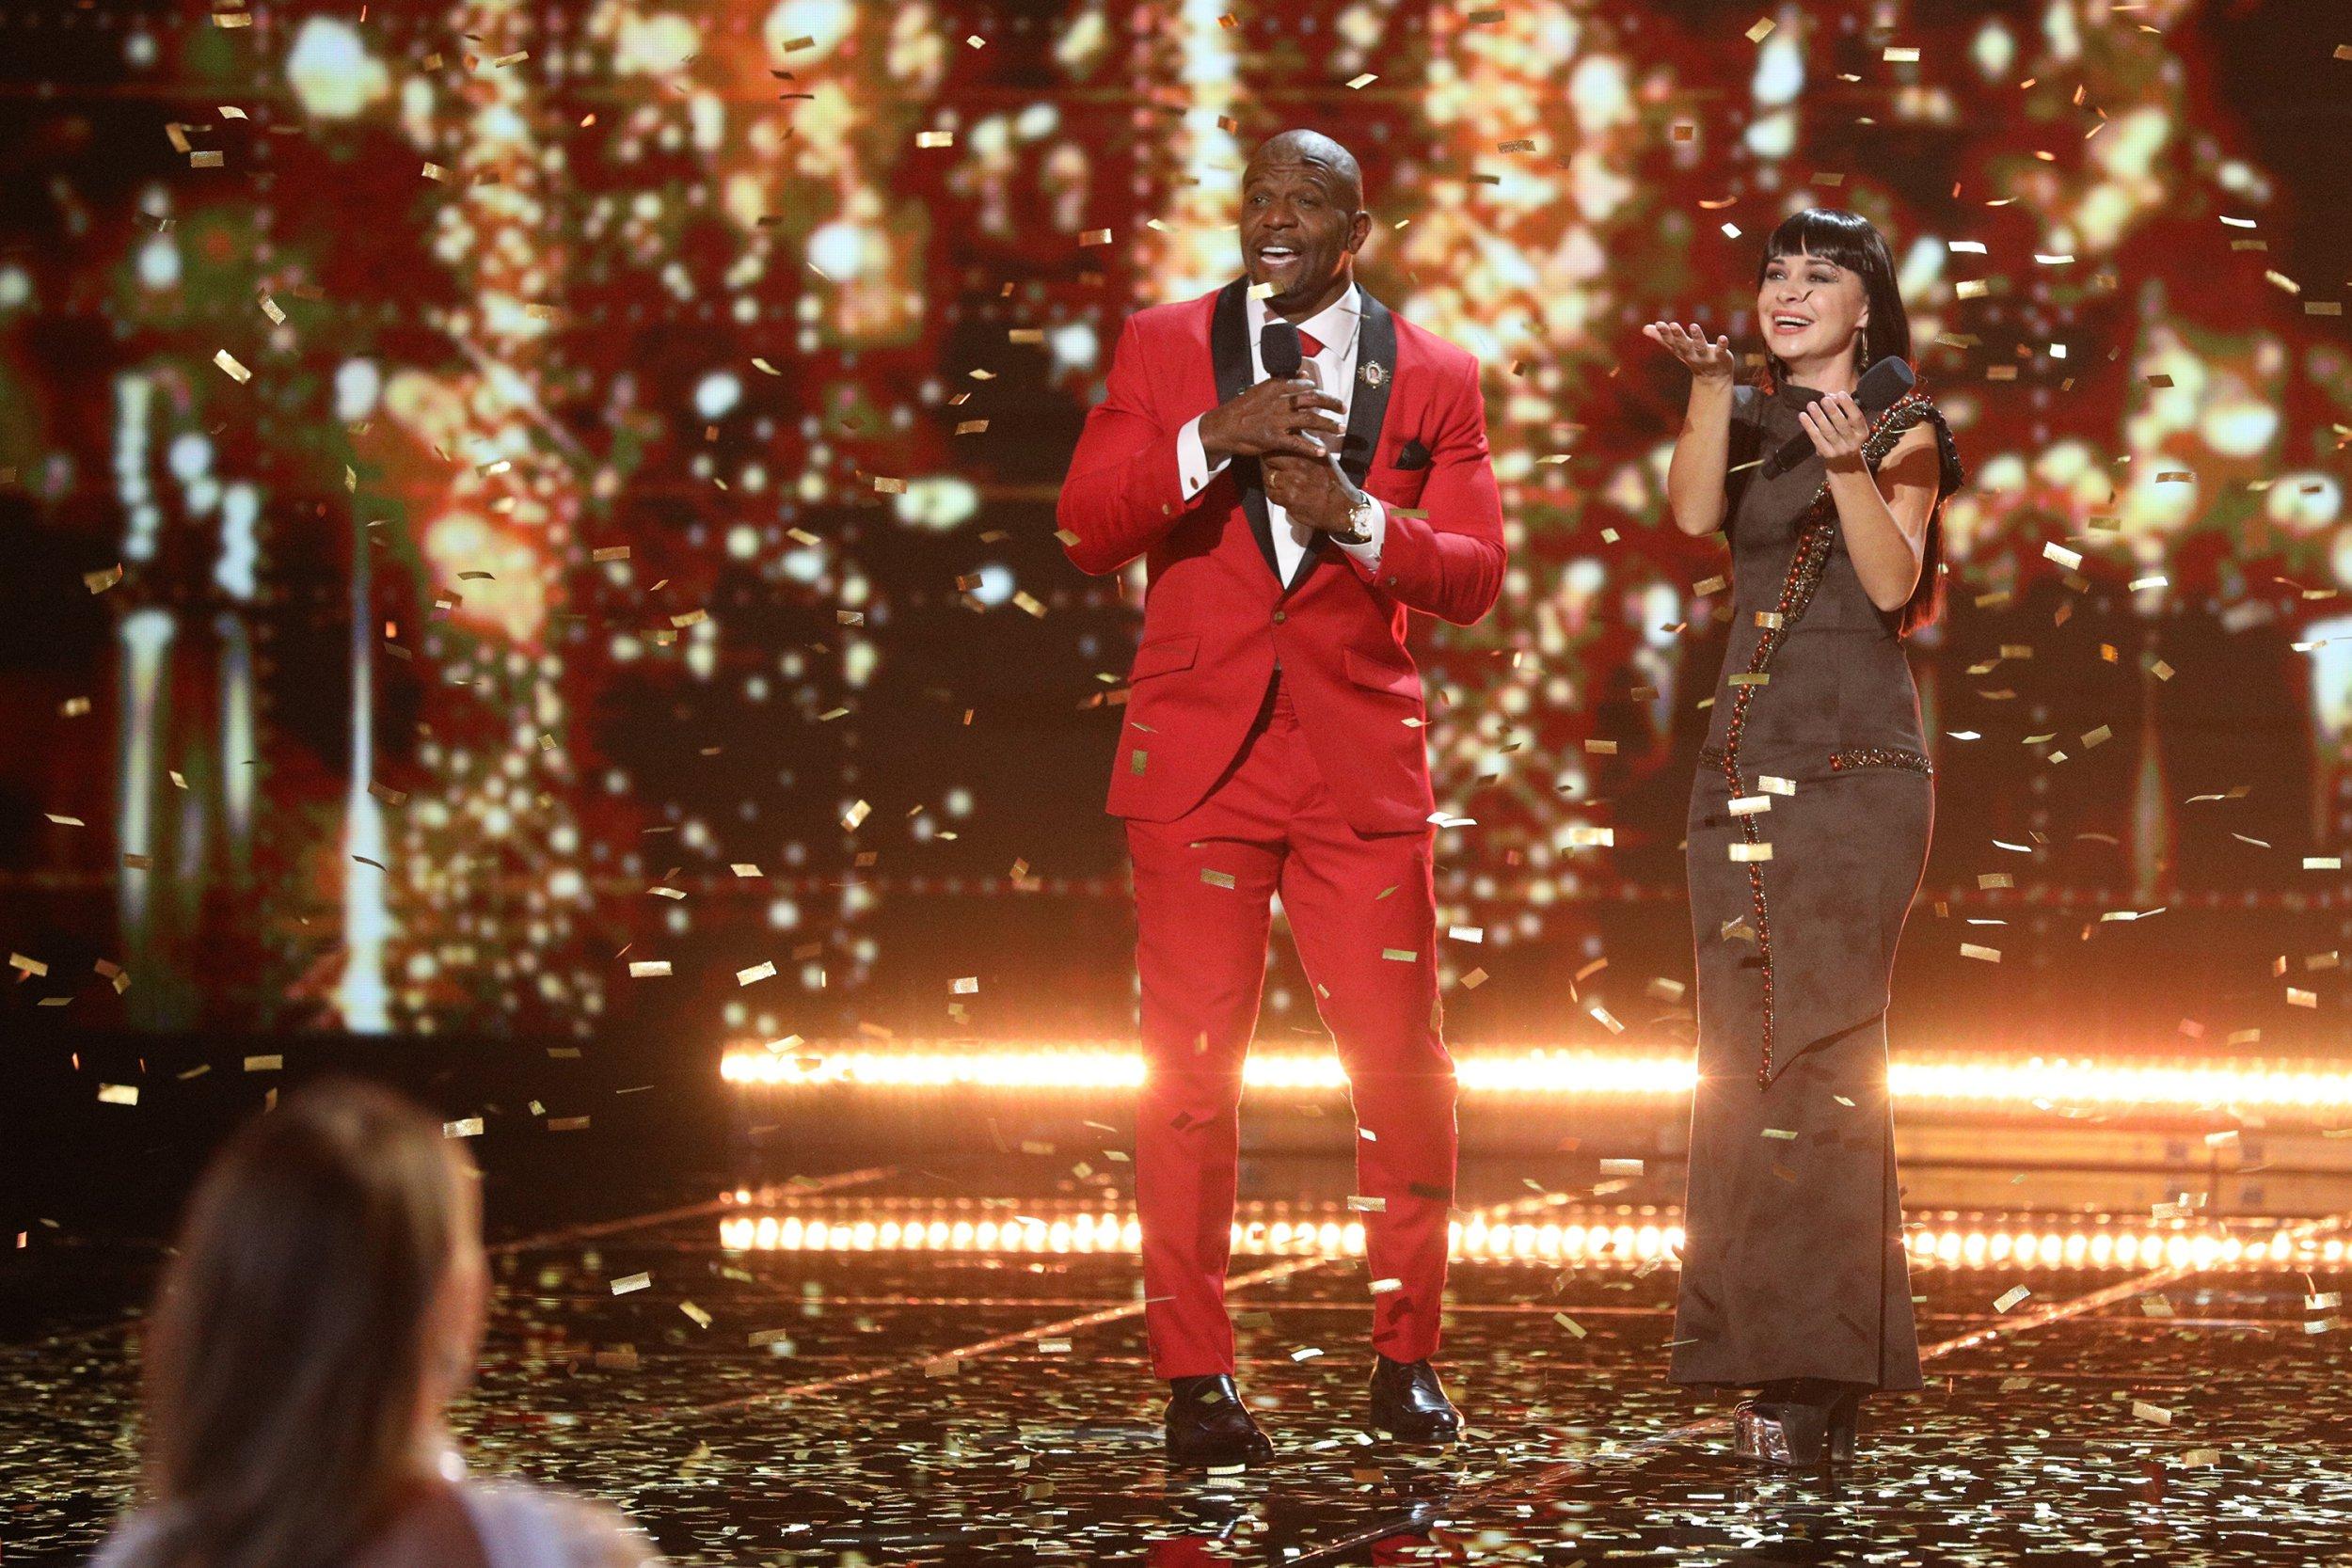 terry crews, host of america's got talent the champions, and contestant Kseniya Simonova